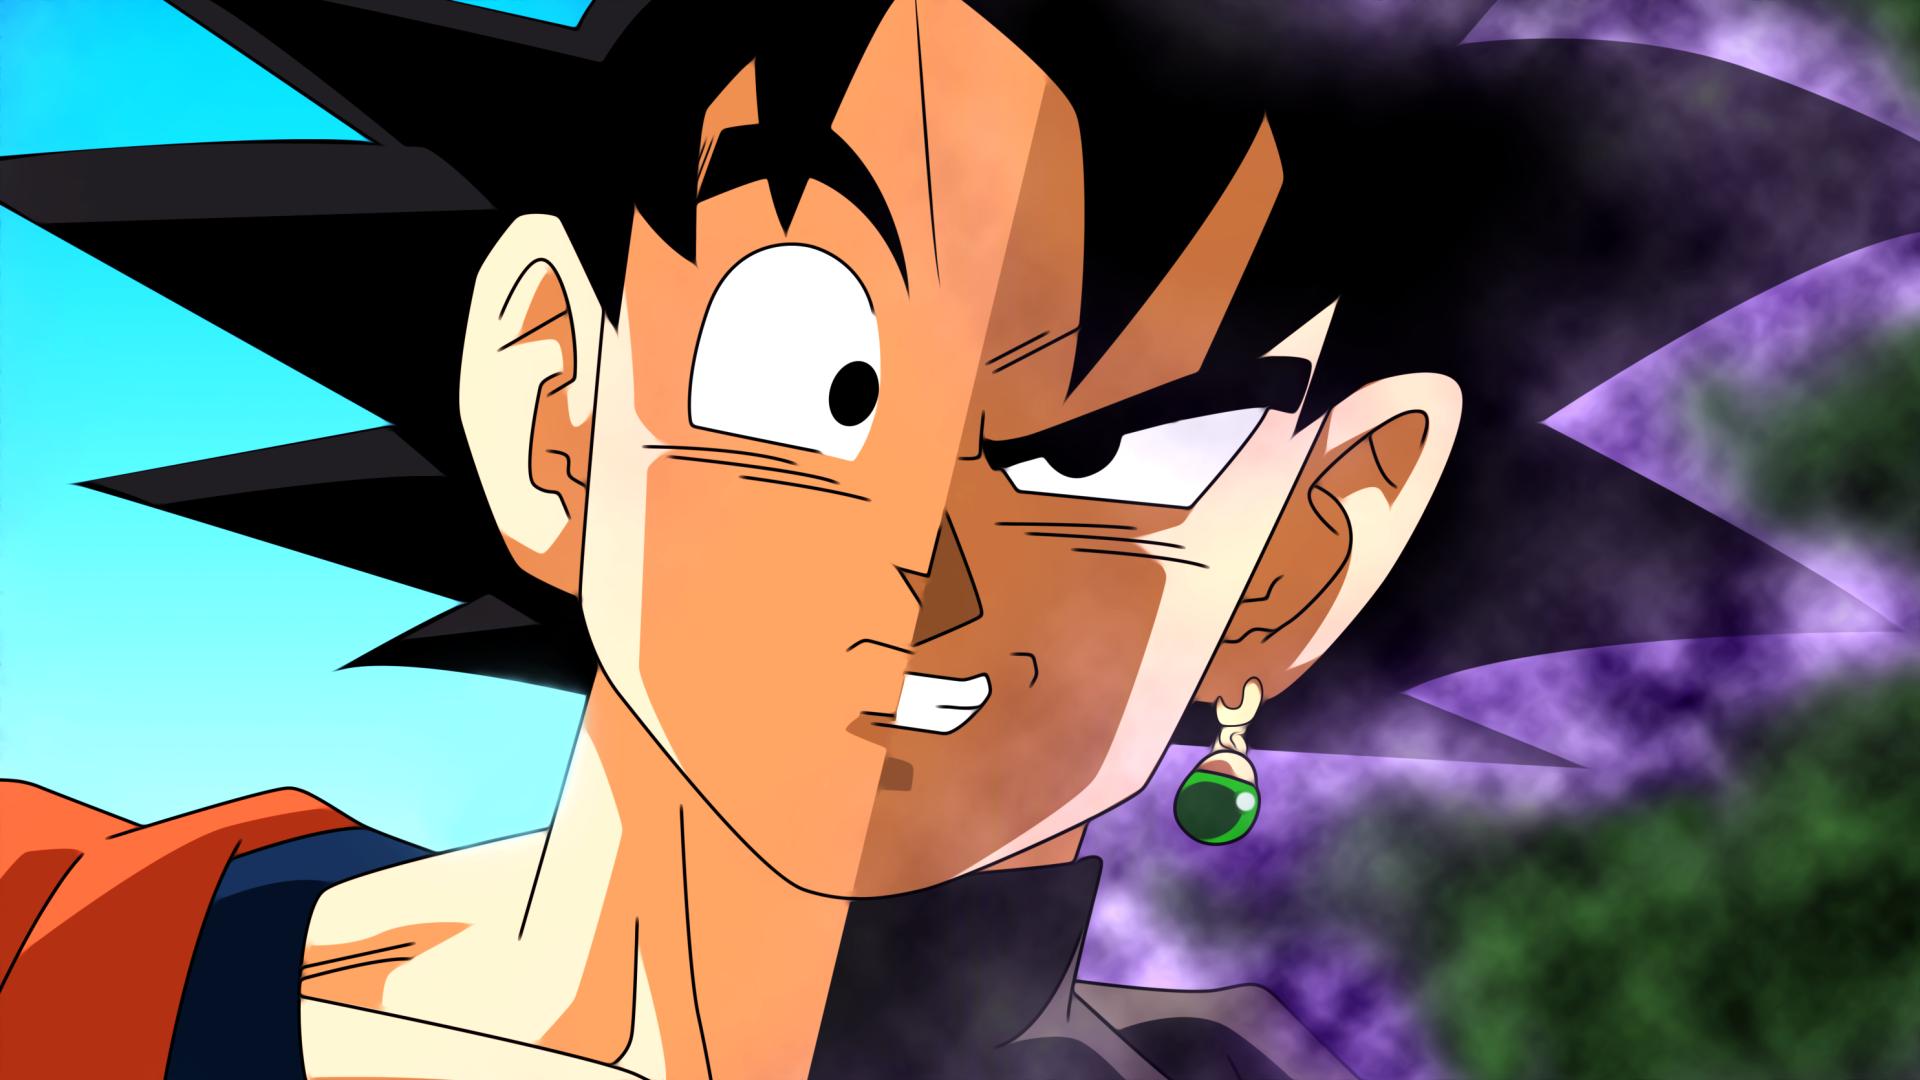 Anime - Dragon Ball Super  Goku Dragon Ball Black Goku Black (Dragon Ball) Fond d'écran